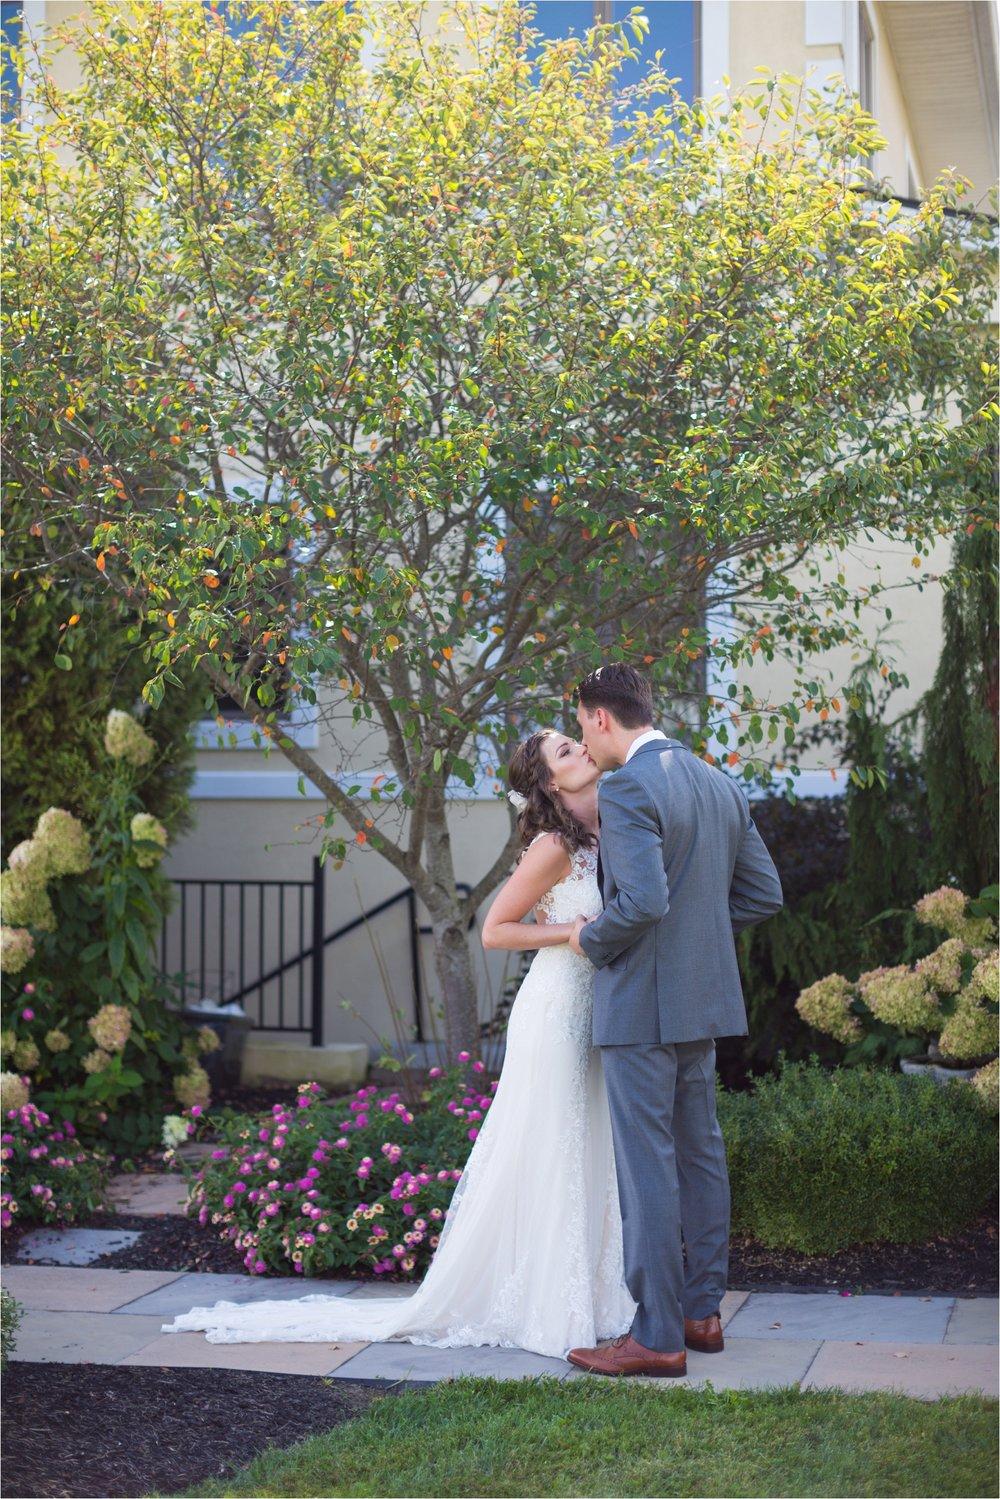 Feather-and-Oak-Photography-Cross-Keys-Vineyard-Wedding-2689.jpg